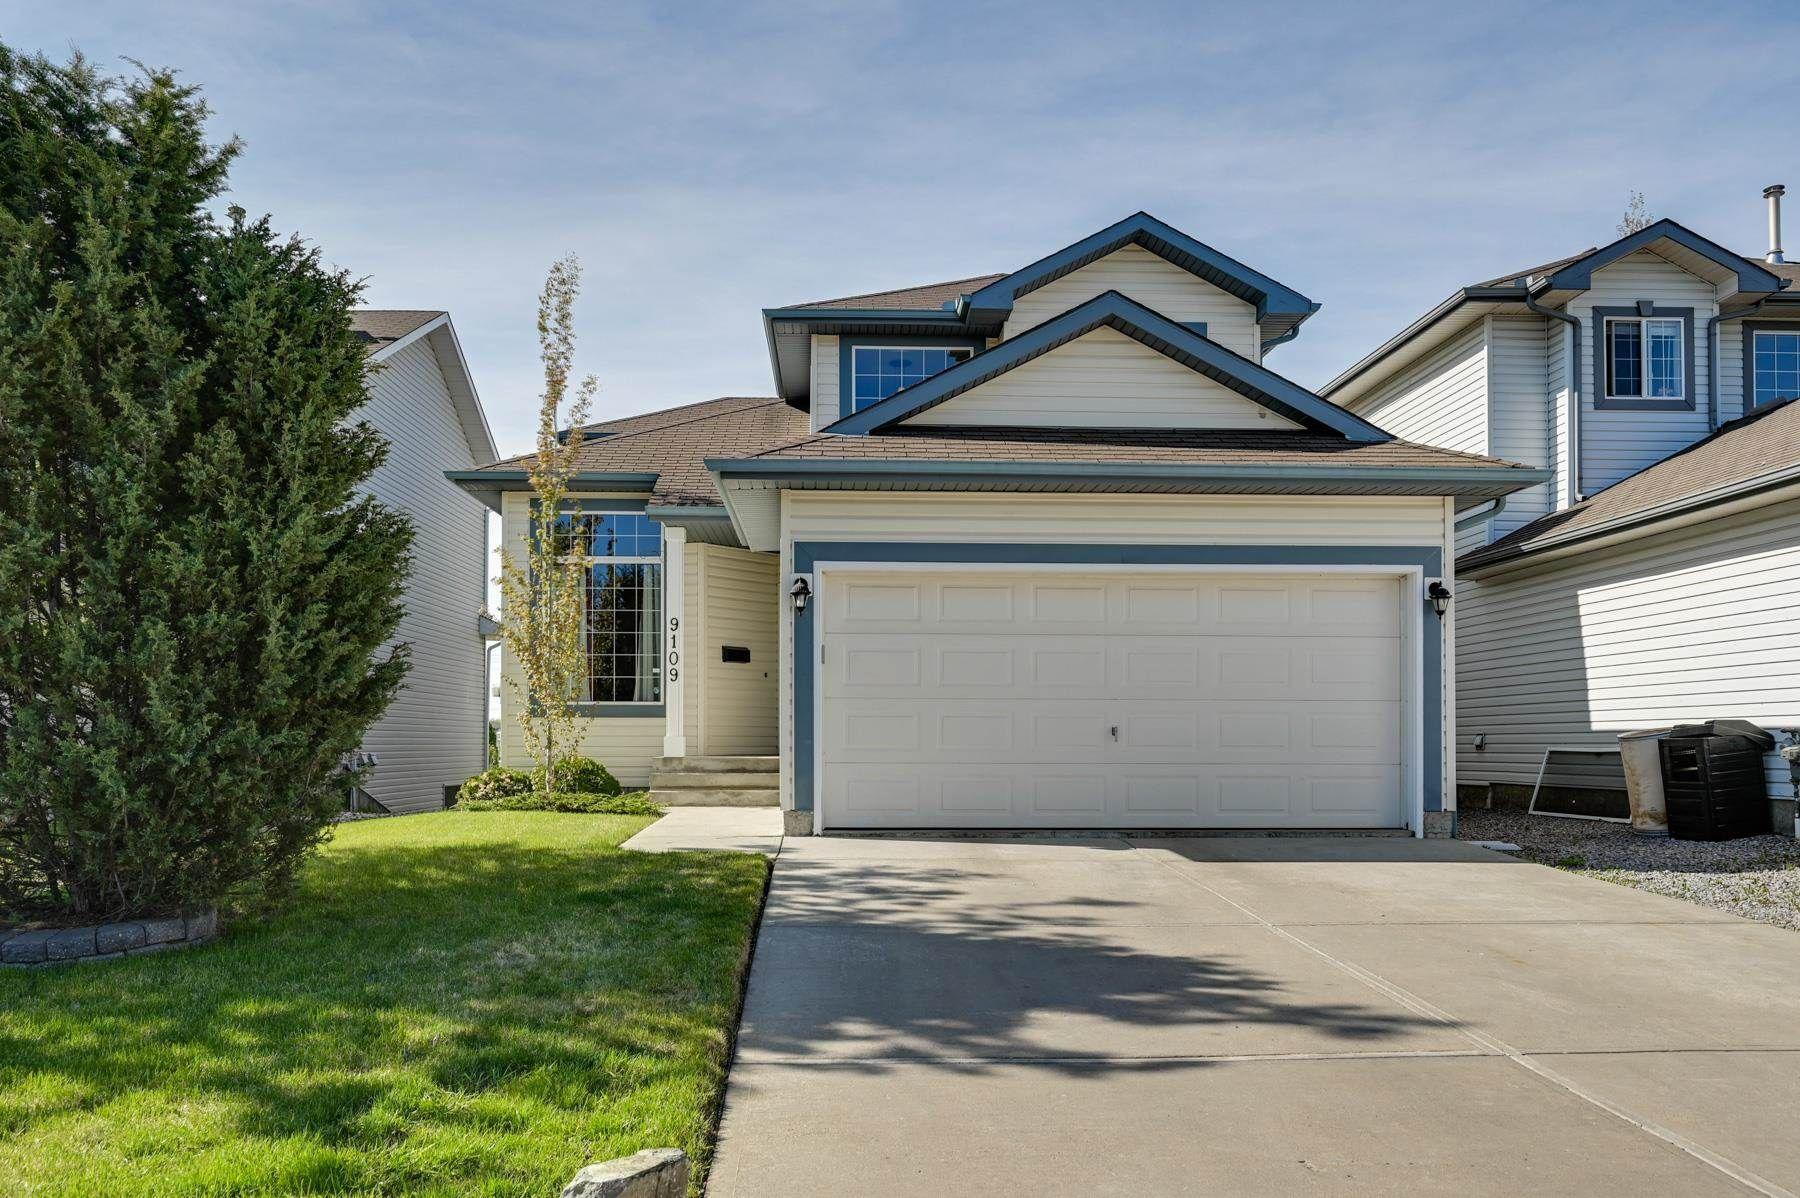 Main Photo: 9109 164 Avenue in Edmonton: Zone 28 House for sale : MLS®# E4246350